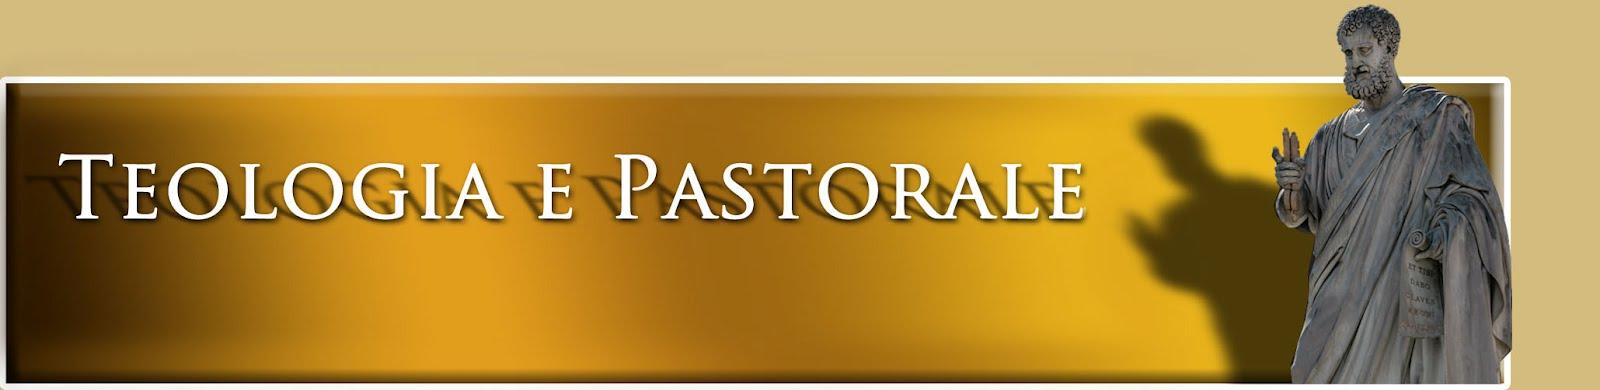 Teologia e Pastorale